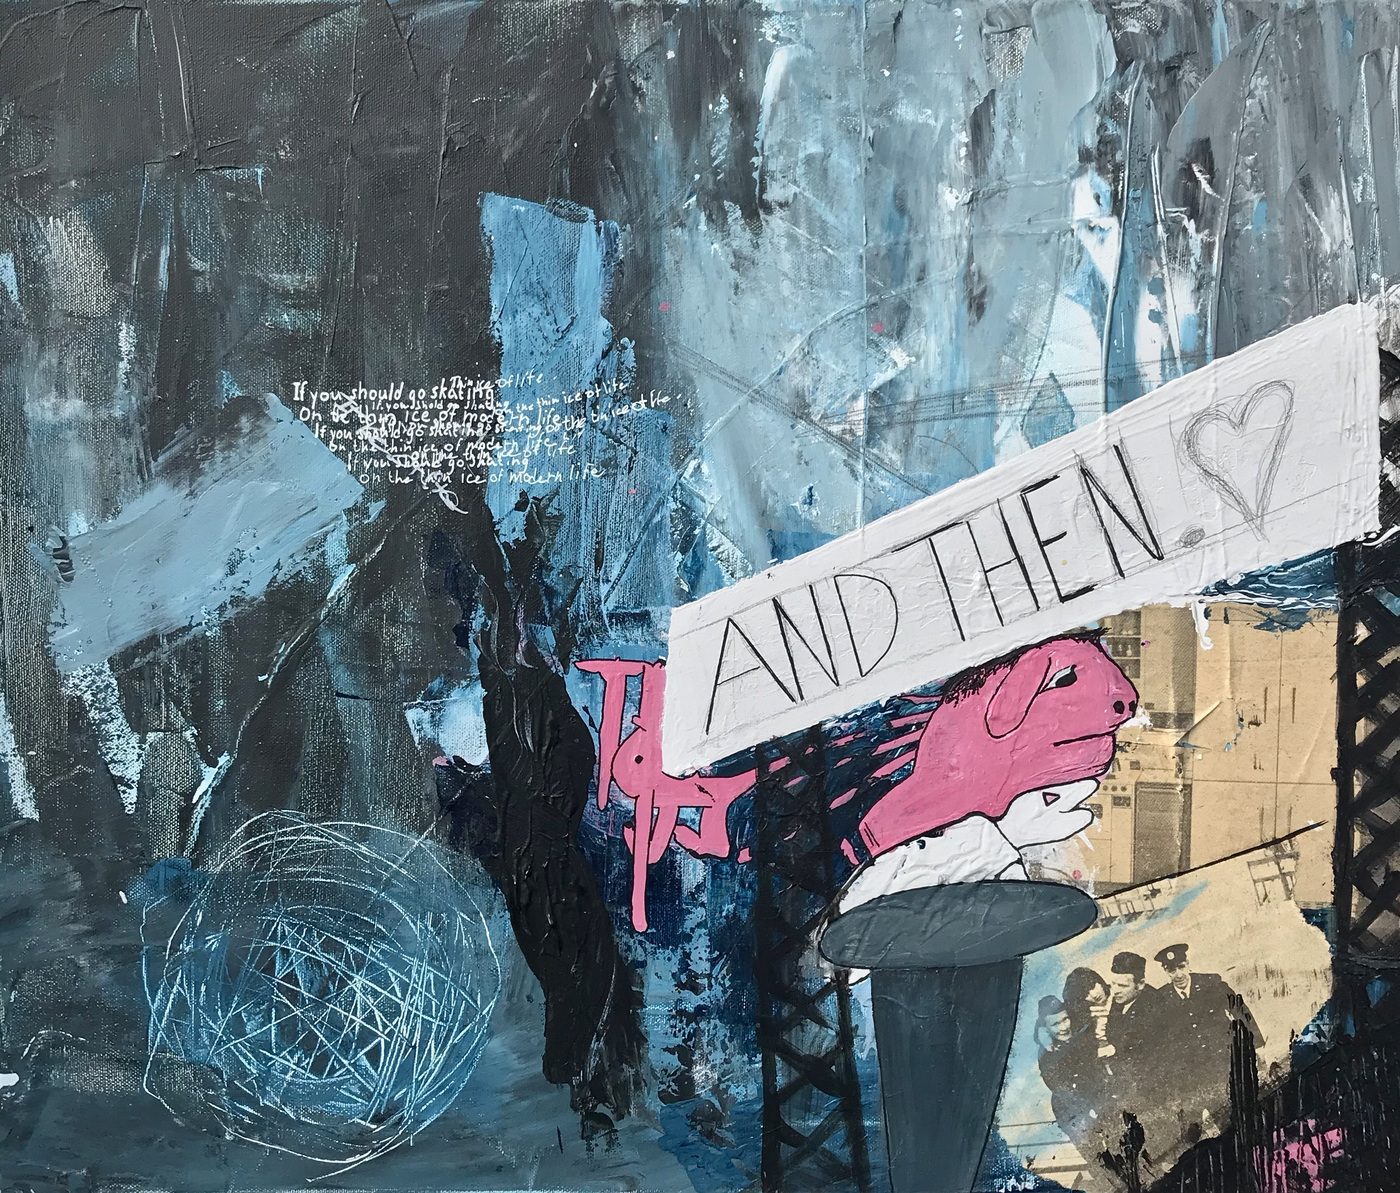 Alexander Ekman Sinclair - ART - Icy memories